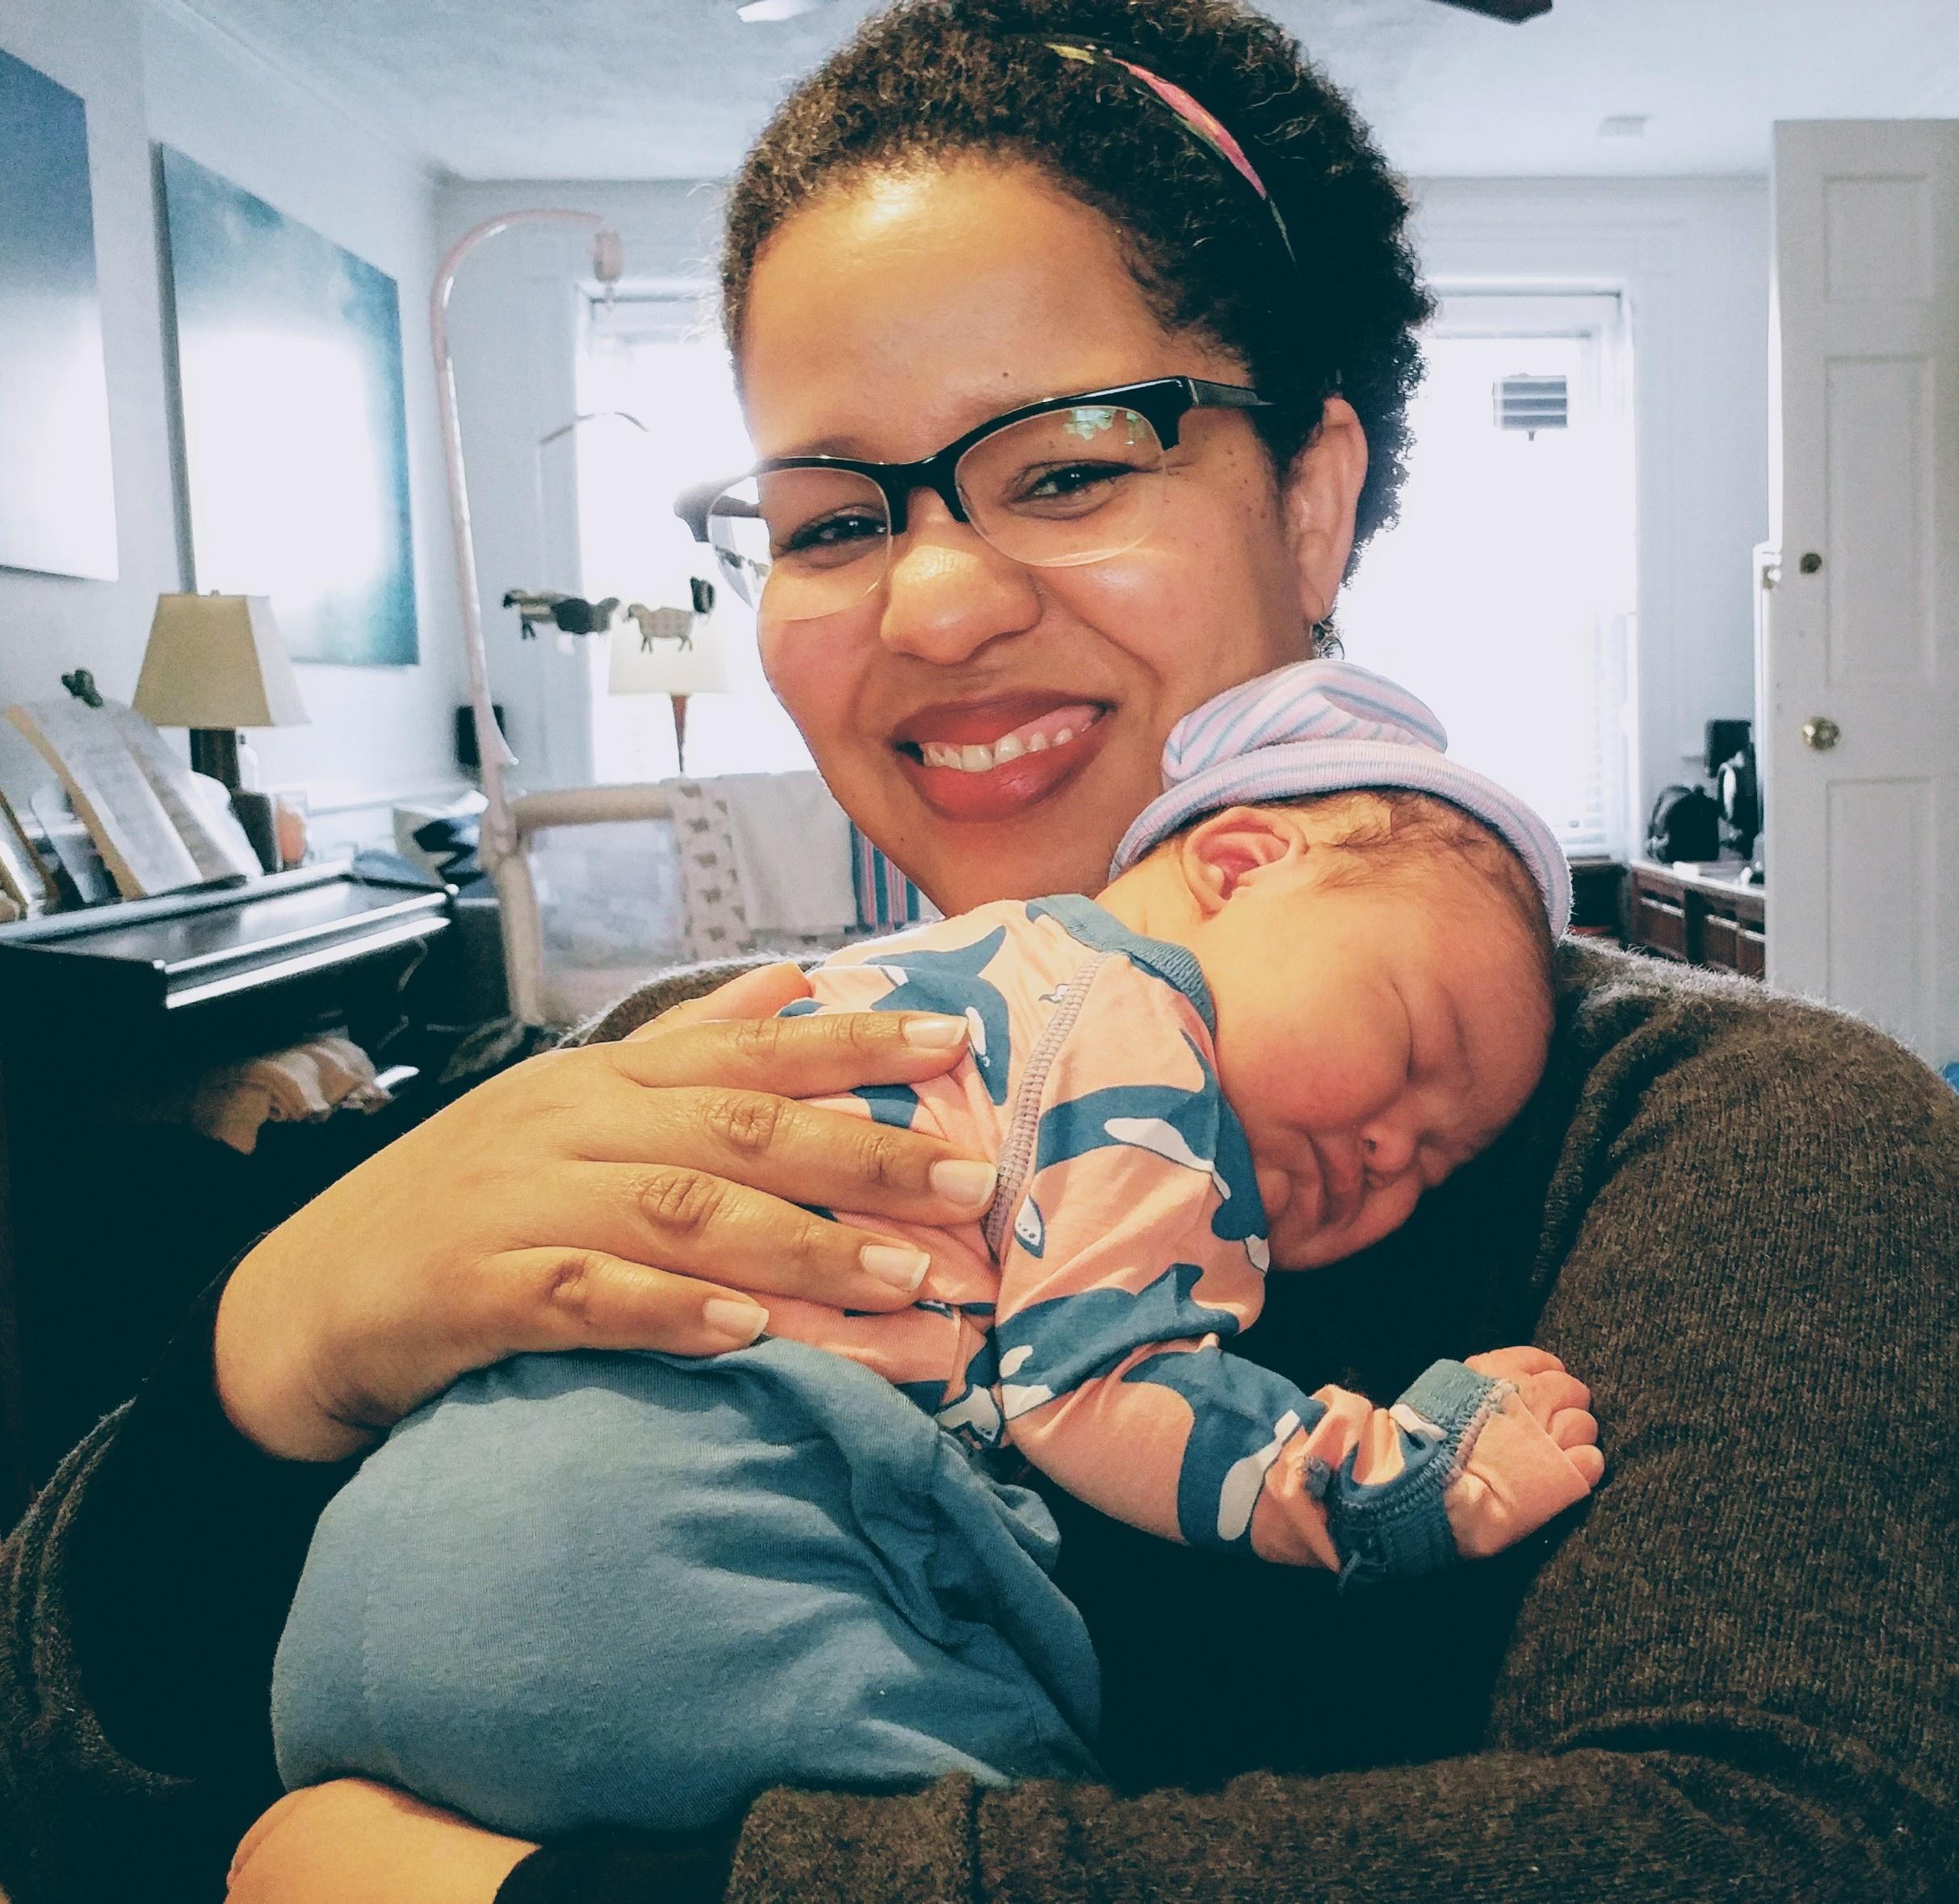 Baby Eyja, a true bundle of joy.